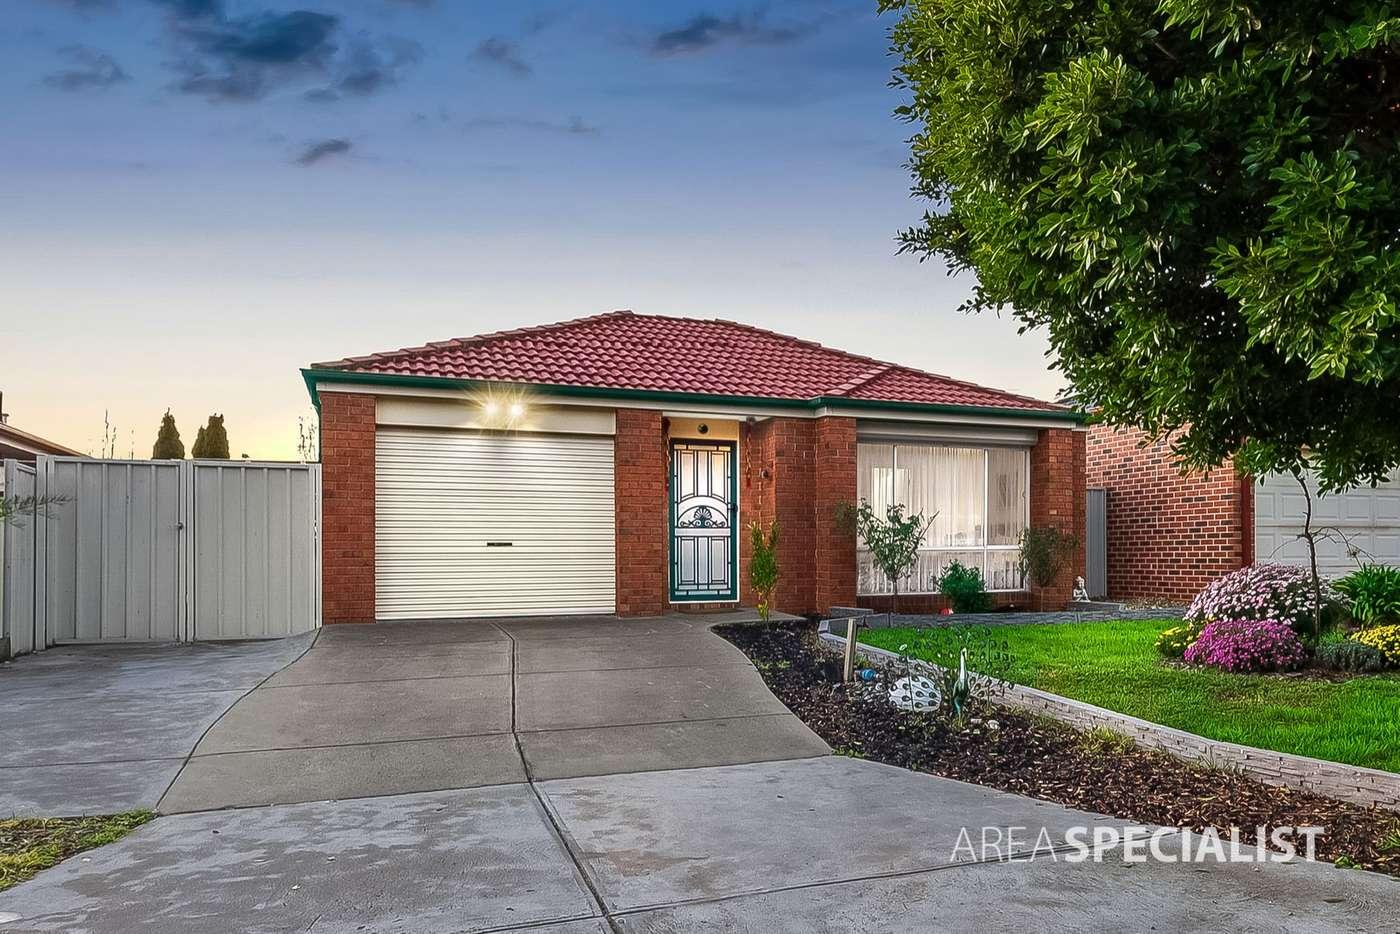 Main view of Homely house listing, 3 Moreton Close, Caroline Springs VIC 3023